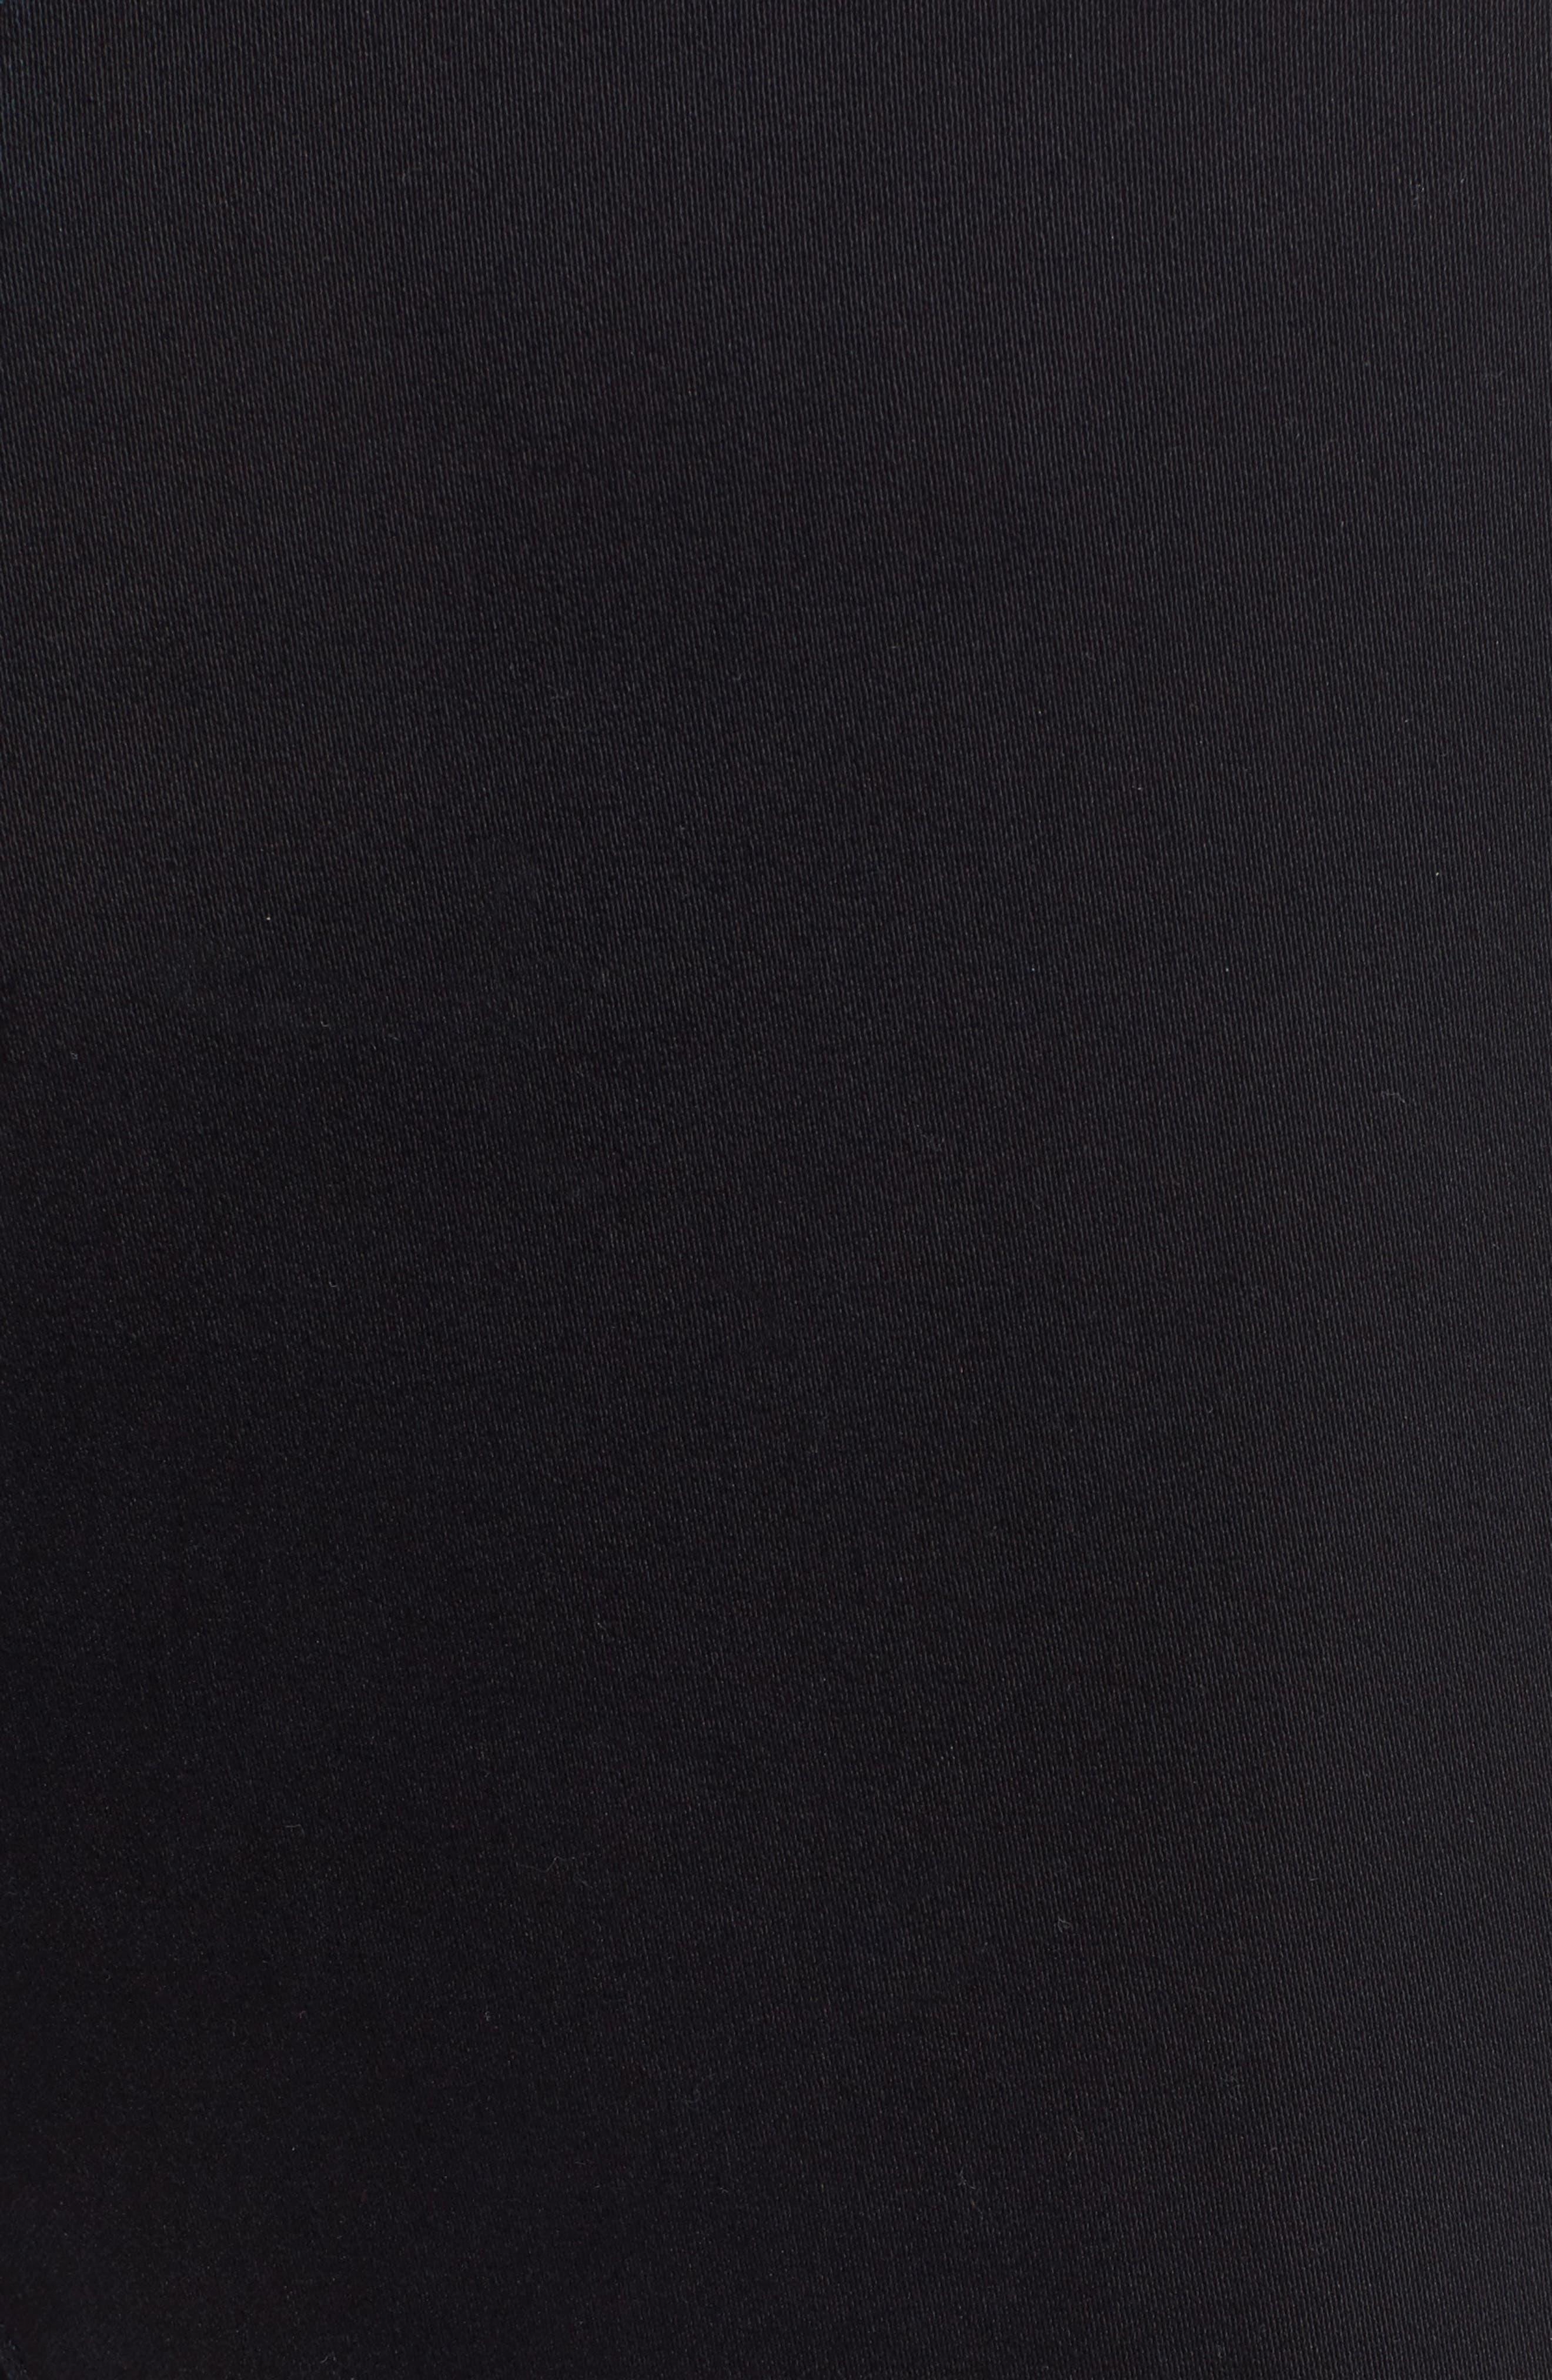 Jay Slim Skinny Fit Jogger Pants,                             Alternate thumbnail 5, color,                             001